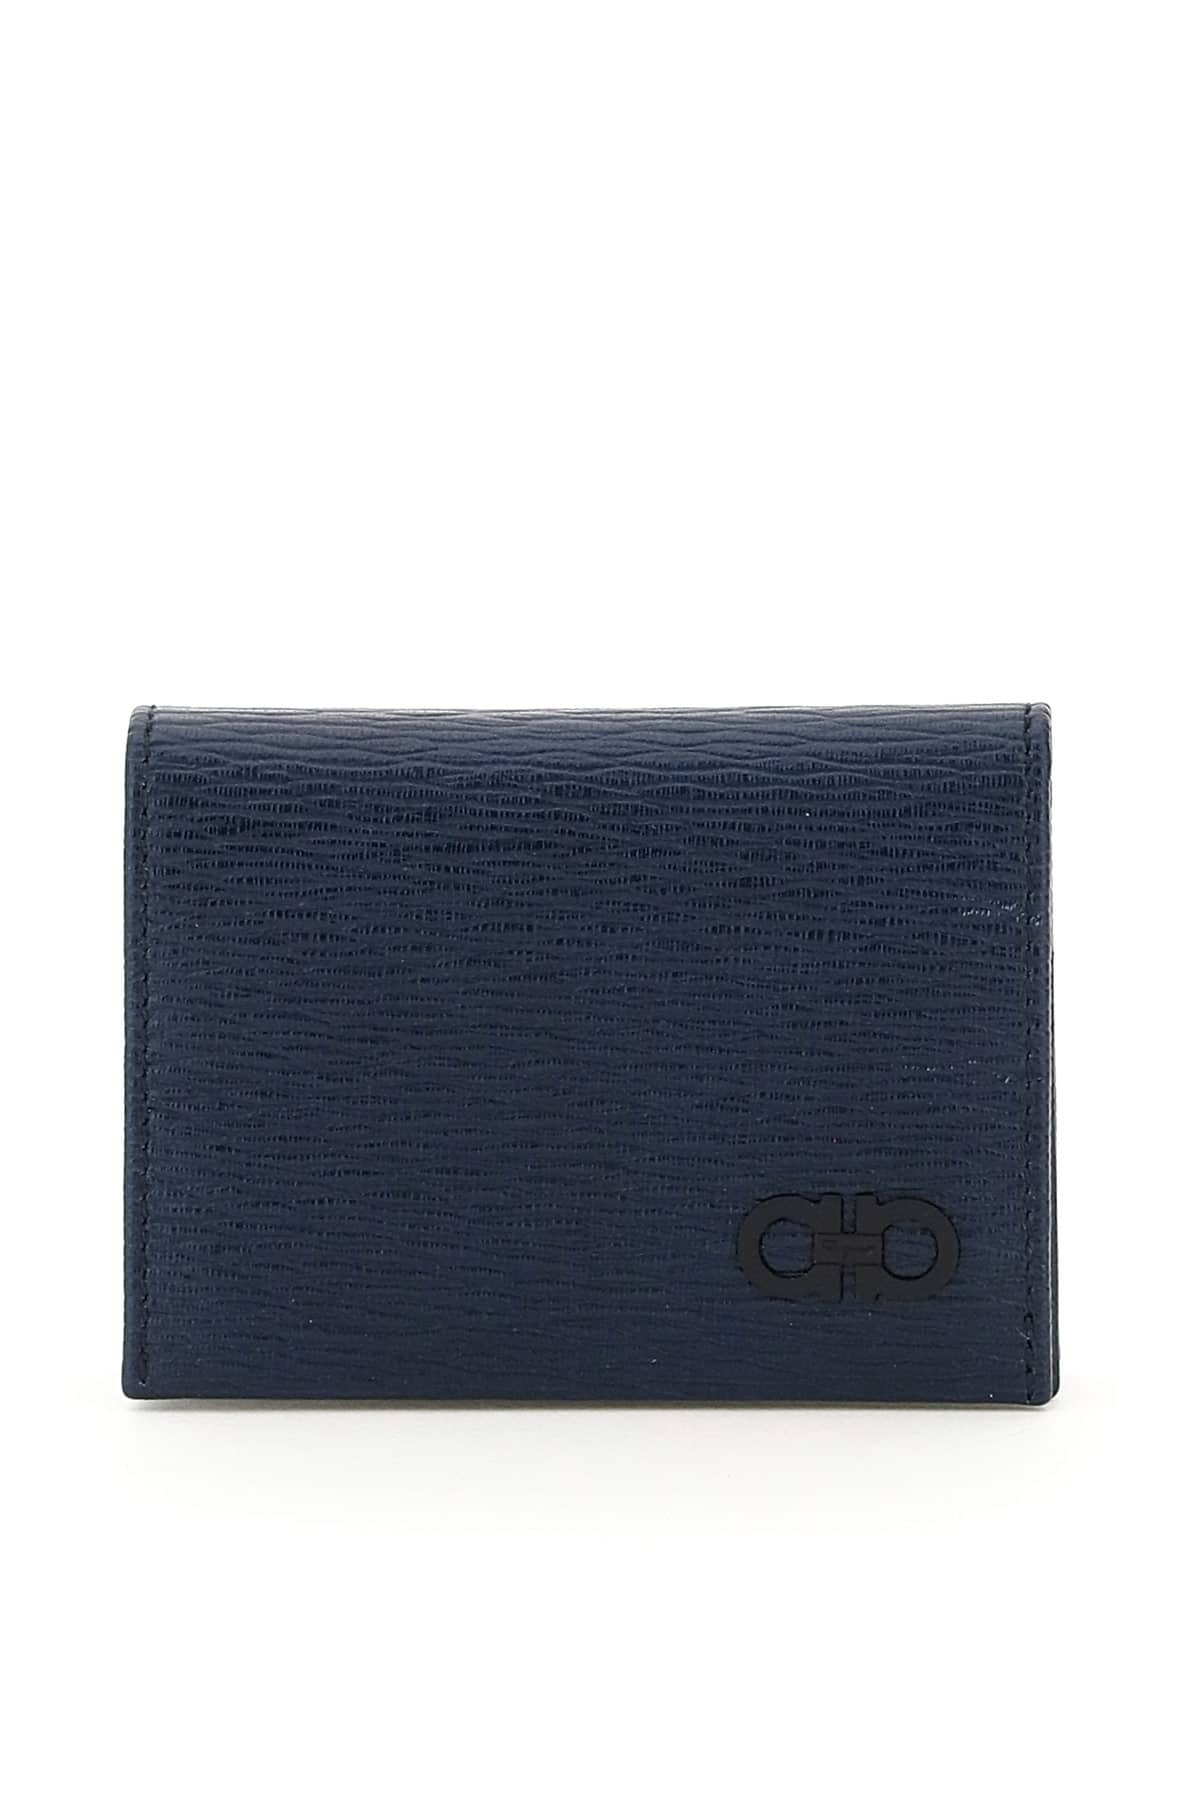 SALVATORE FERRAGAMO GANCINI CARD HOLDER OS Blue Leather